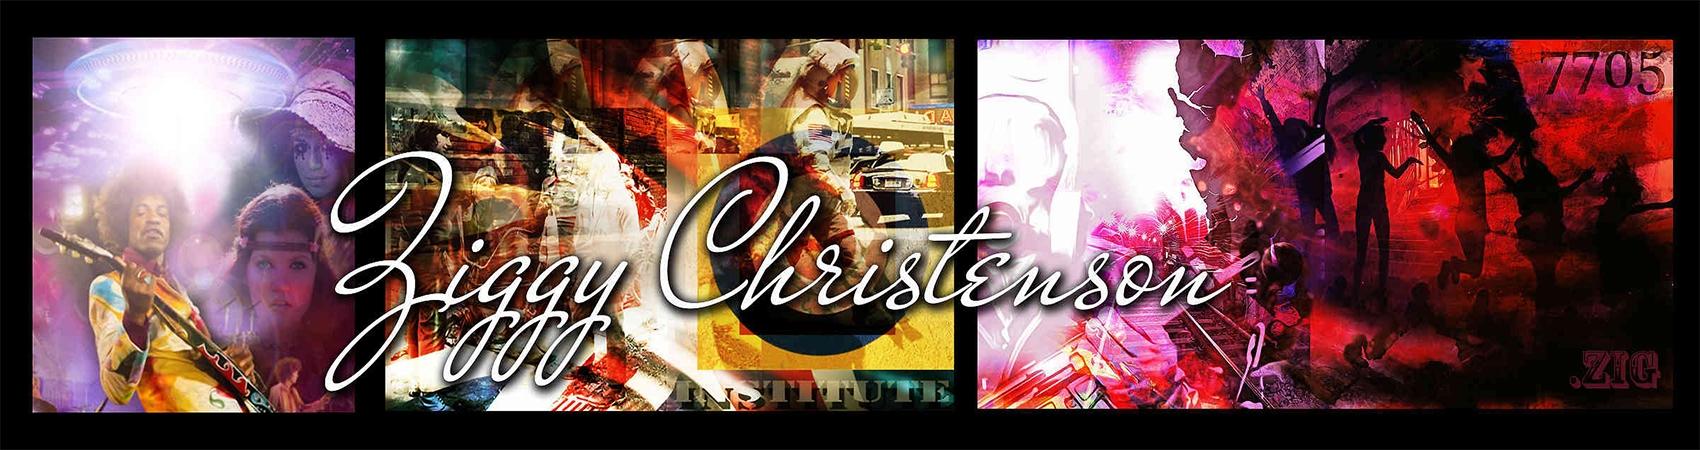 Ziggy Christenson (@ziggychristenson) Cover Image